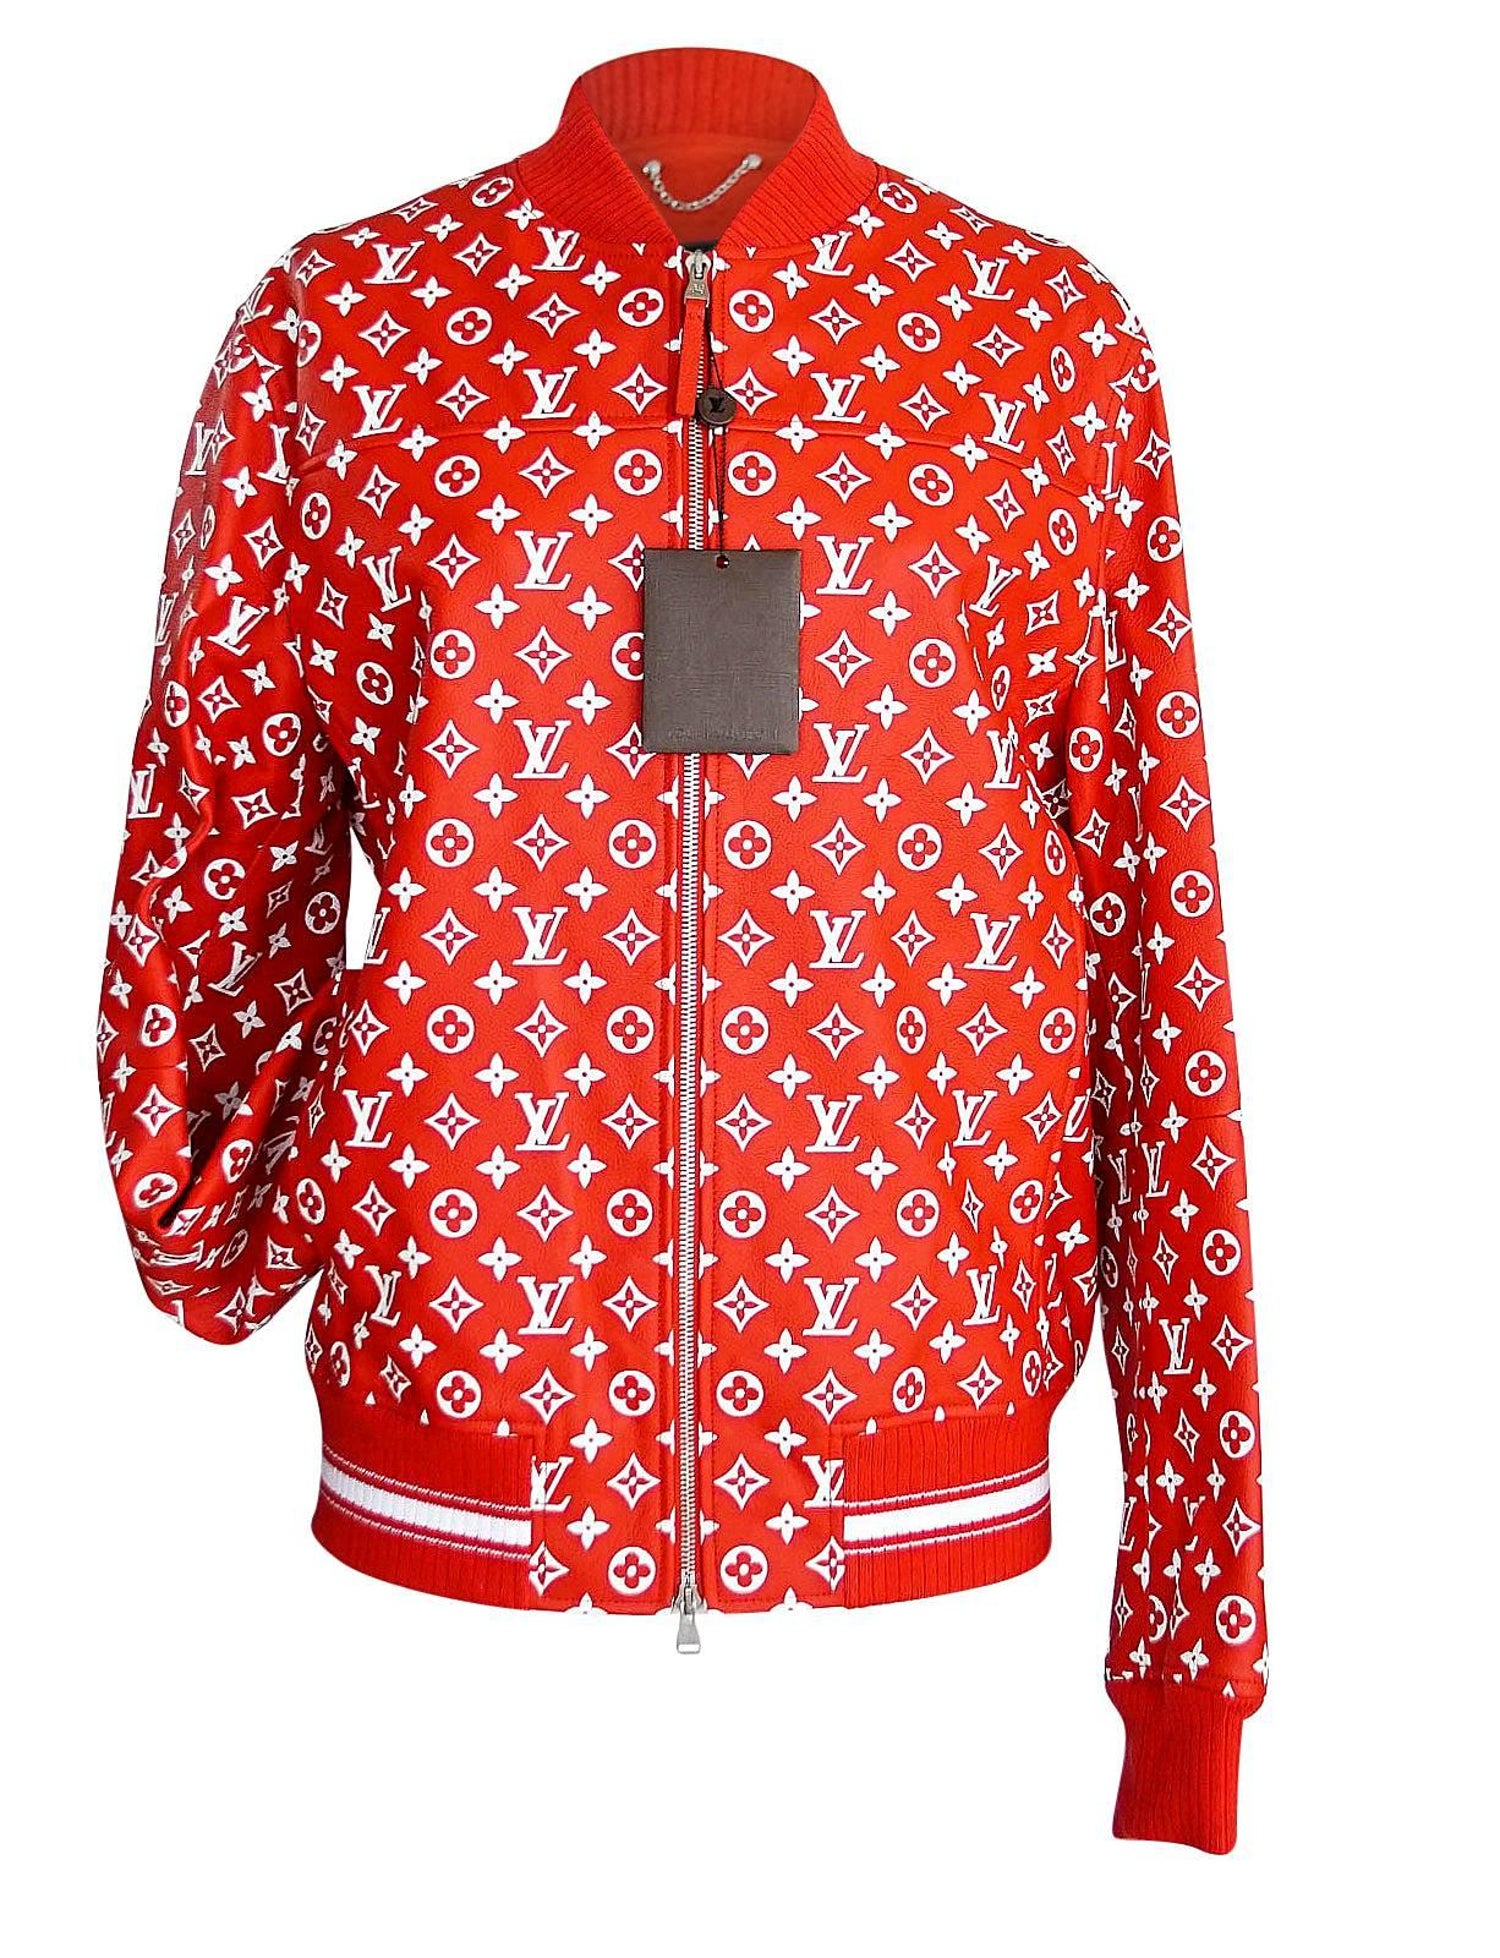 73d96cbc894a Louis Vuitton Supreme X Leather Bomber Varsity Jacket Monogram Ltd Ed size  50 For Sale at 1stdibs